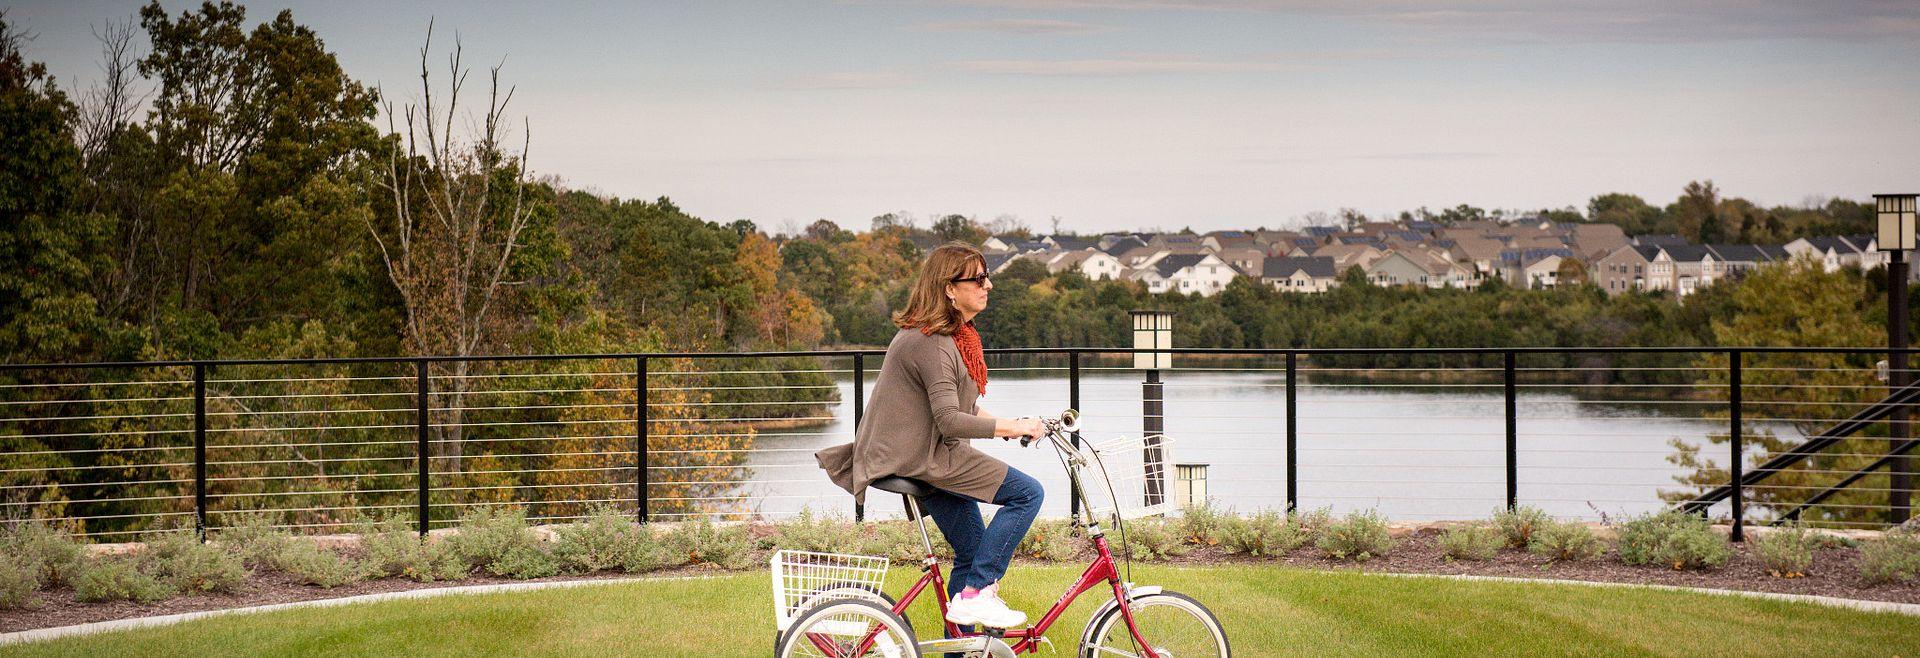 Woman riding on a bike at Trilogy at Lake Frederick